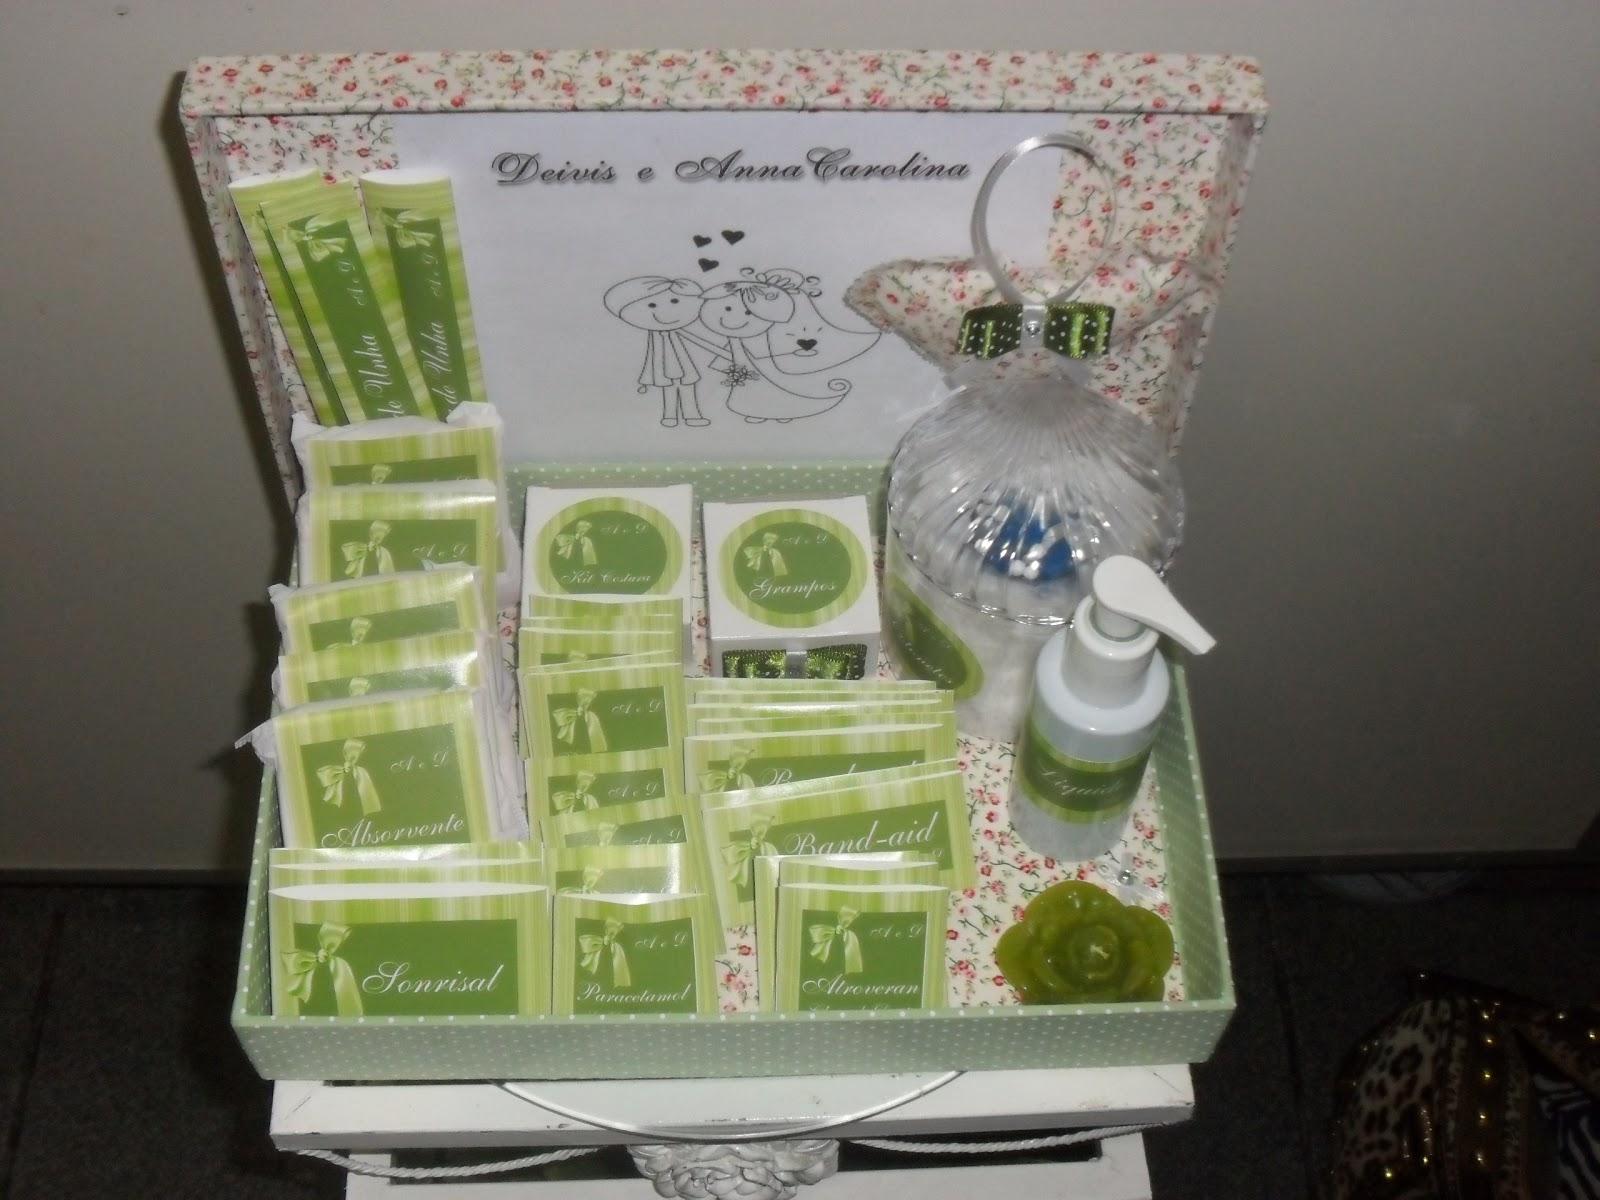 Molde Kit Banheiro Casamento Como Fazer : Casamento casa e outras coisas kit banheiro da anna